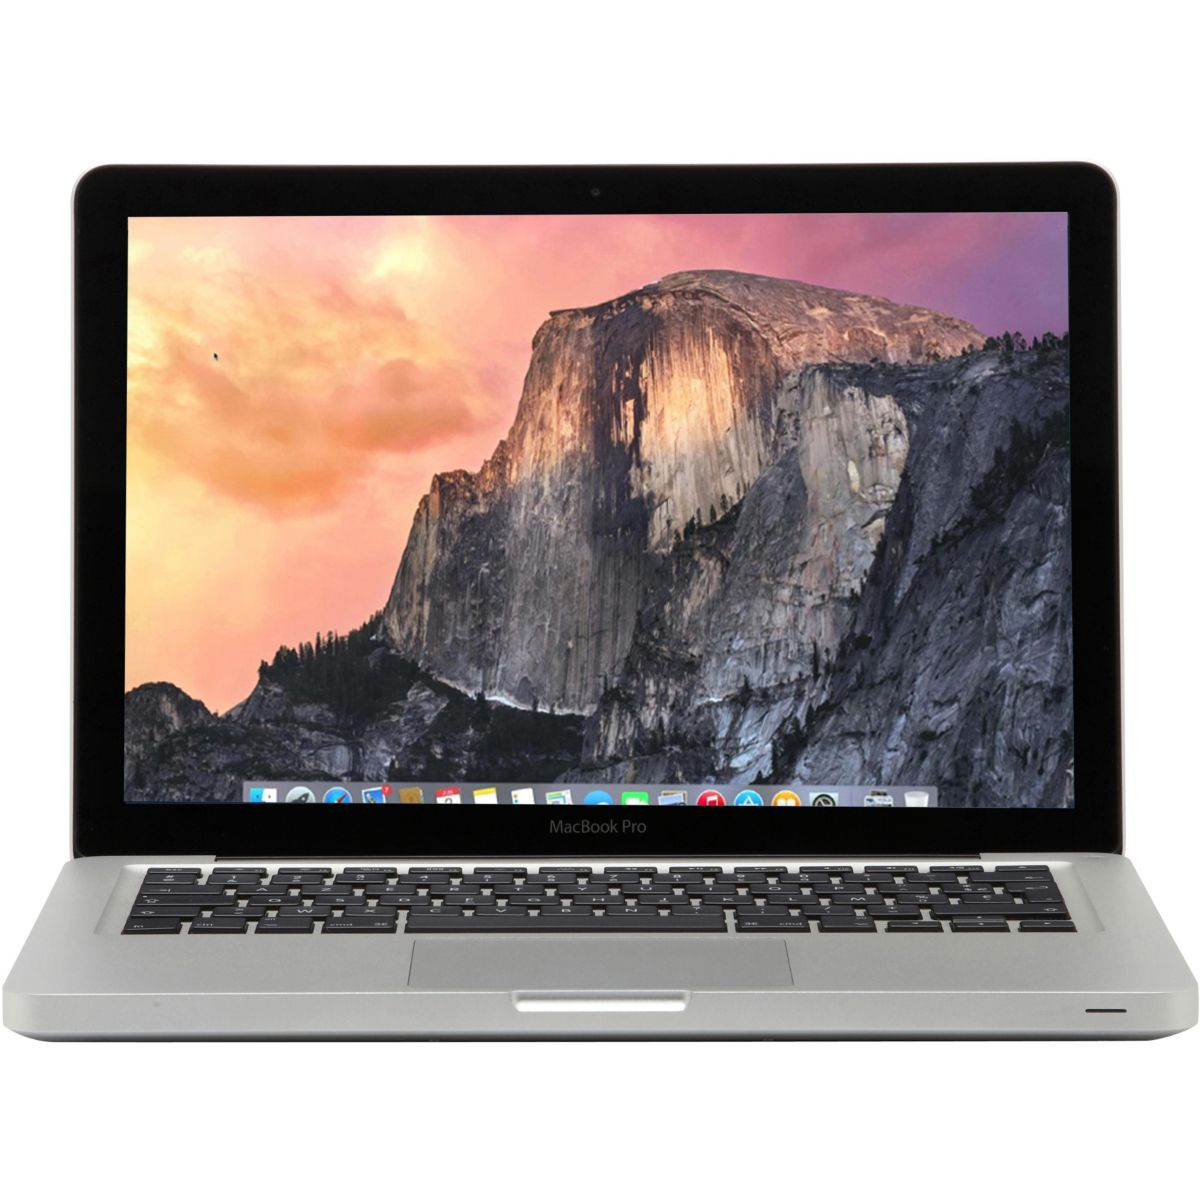 APPLE Macbook Pro 13.3 2.5GHz 4Go 500Go (photo)